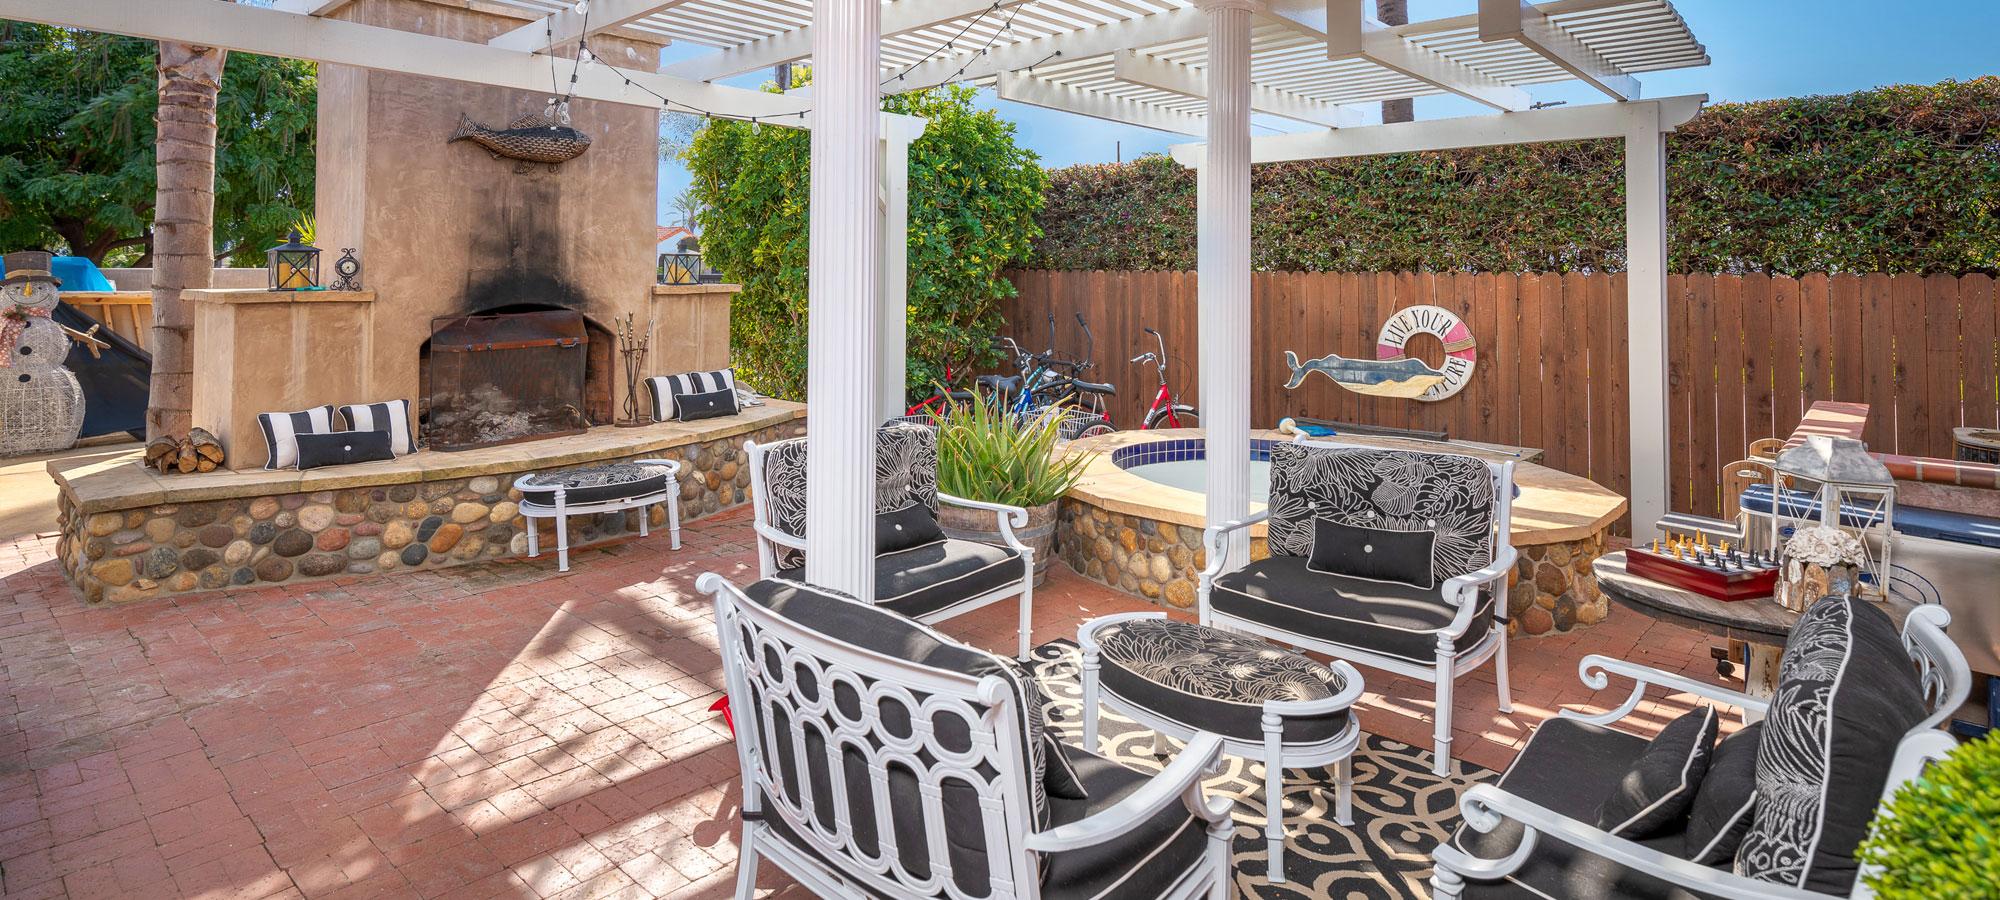 470 E St. Chula Vista, CA 91910